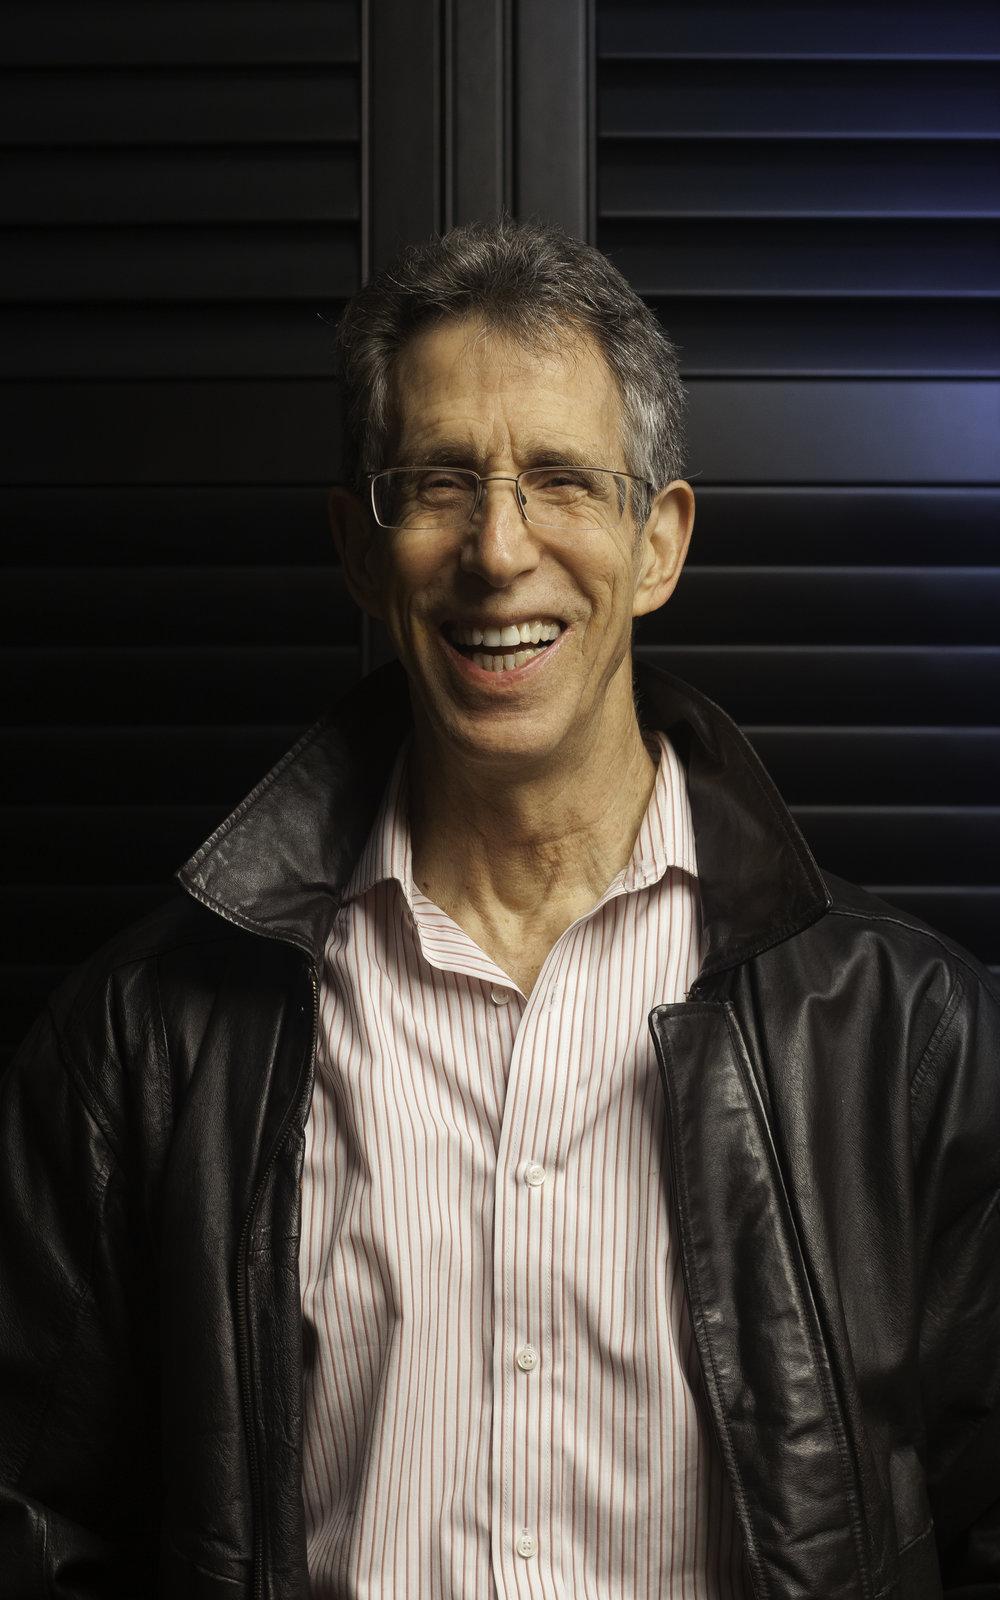 Tony Glassman